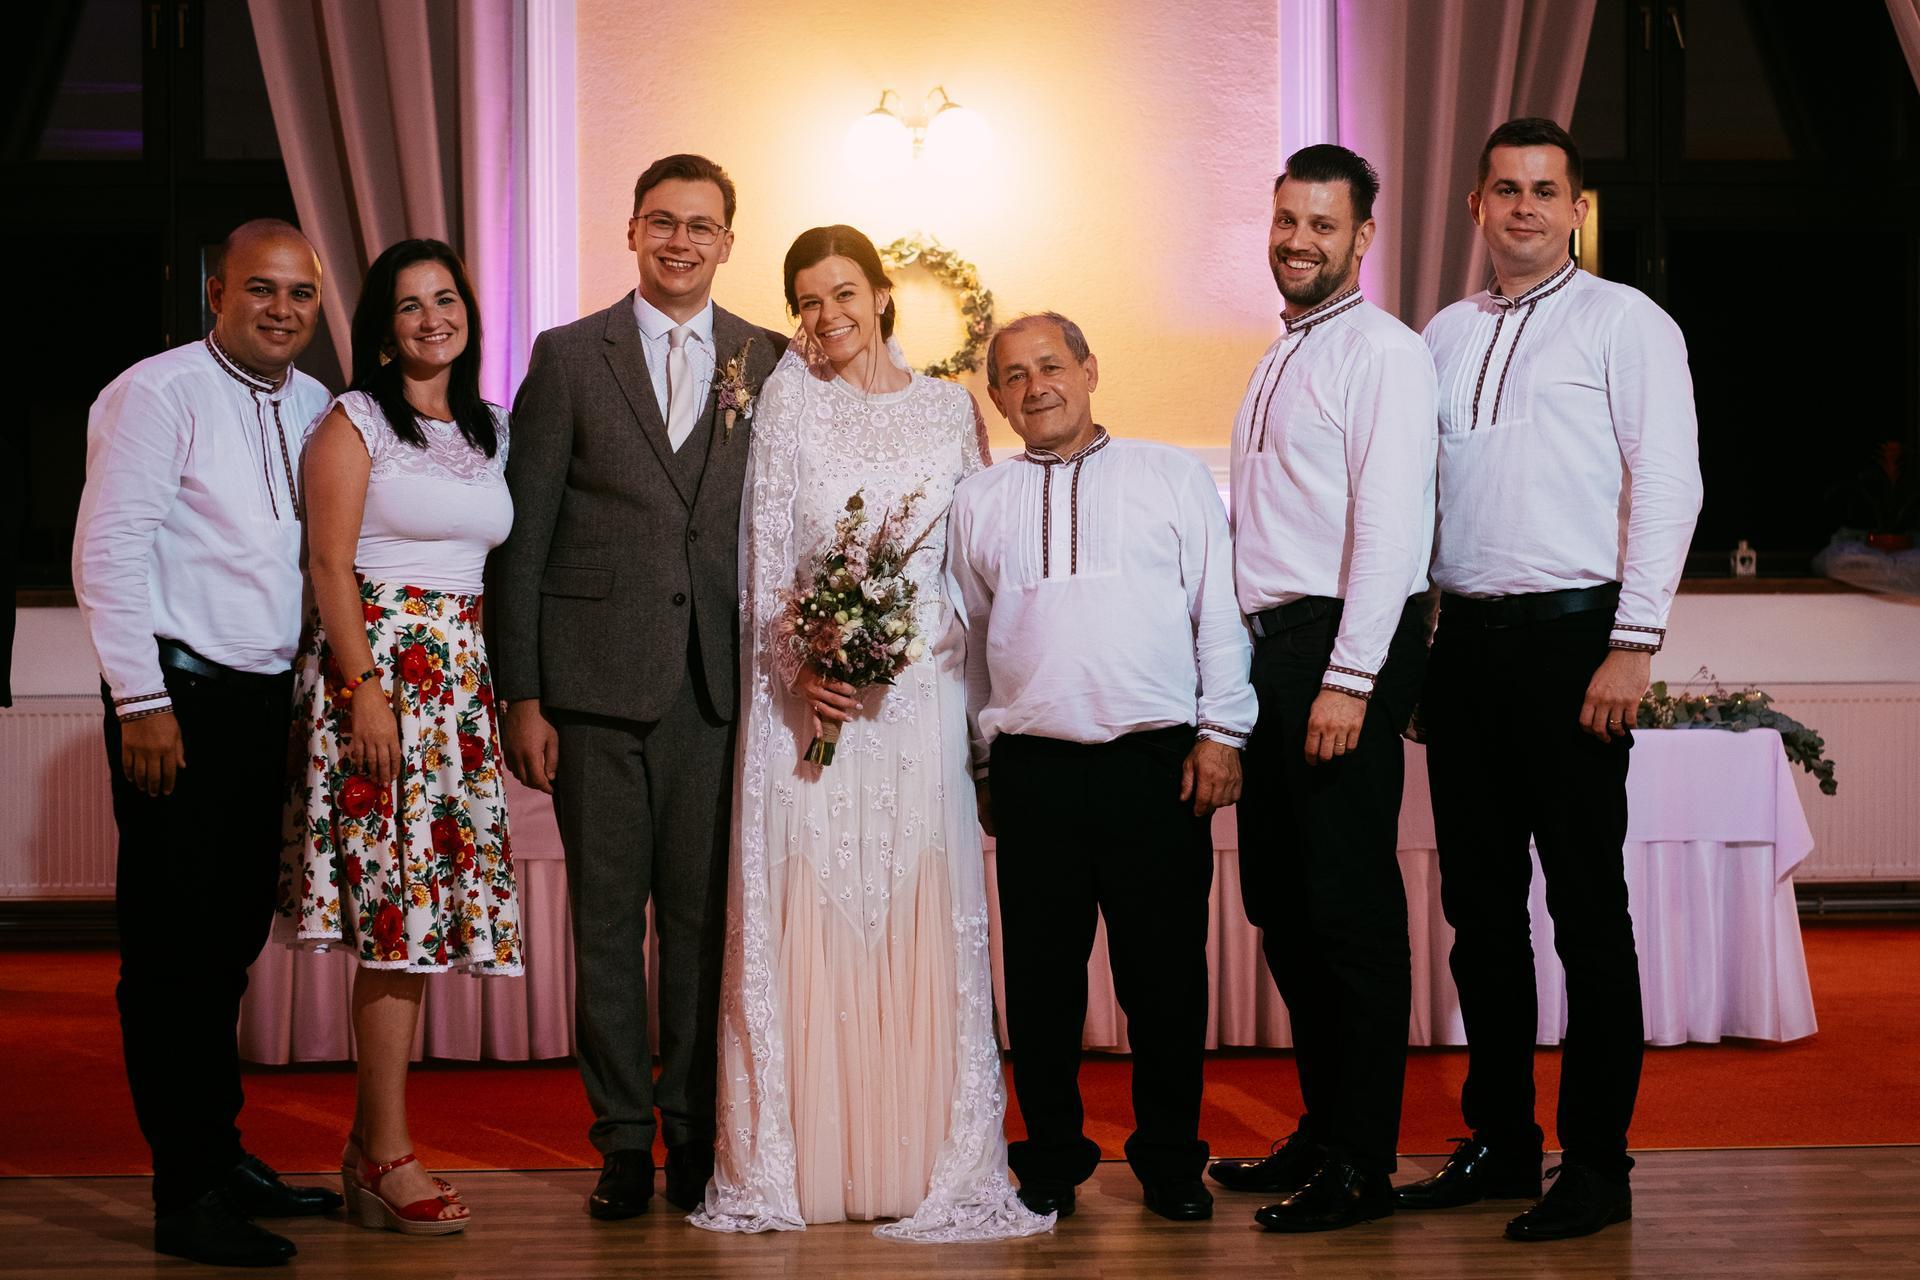 Svadba, Reduta Poprad 08/2020 - Obrázok č. 6